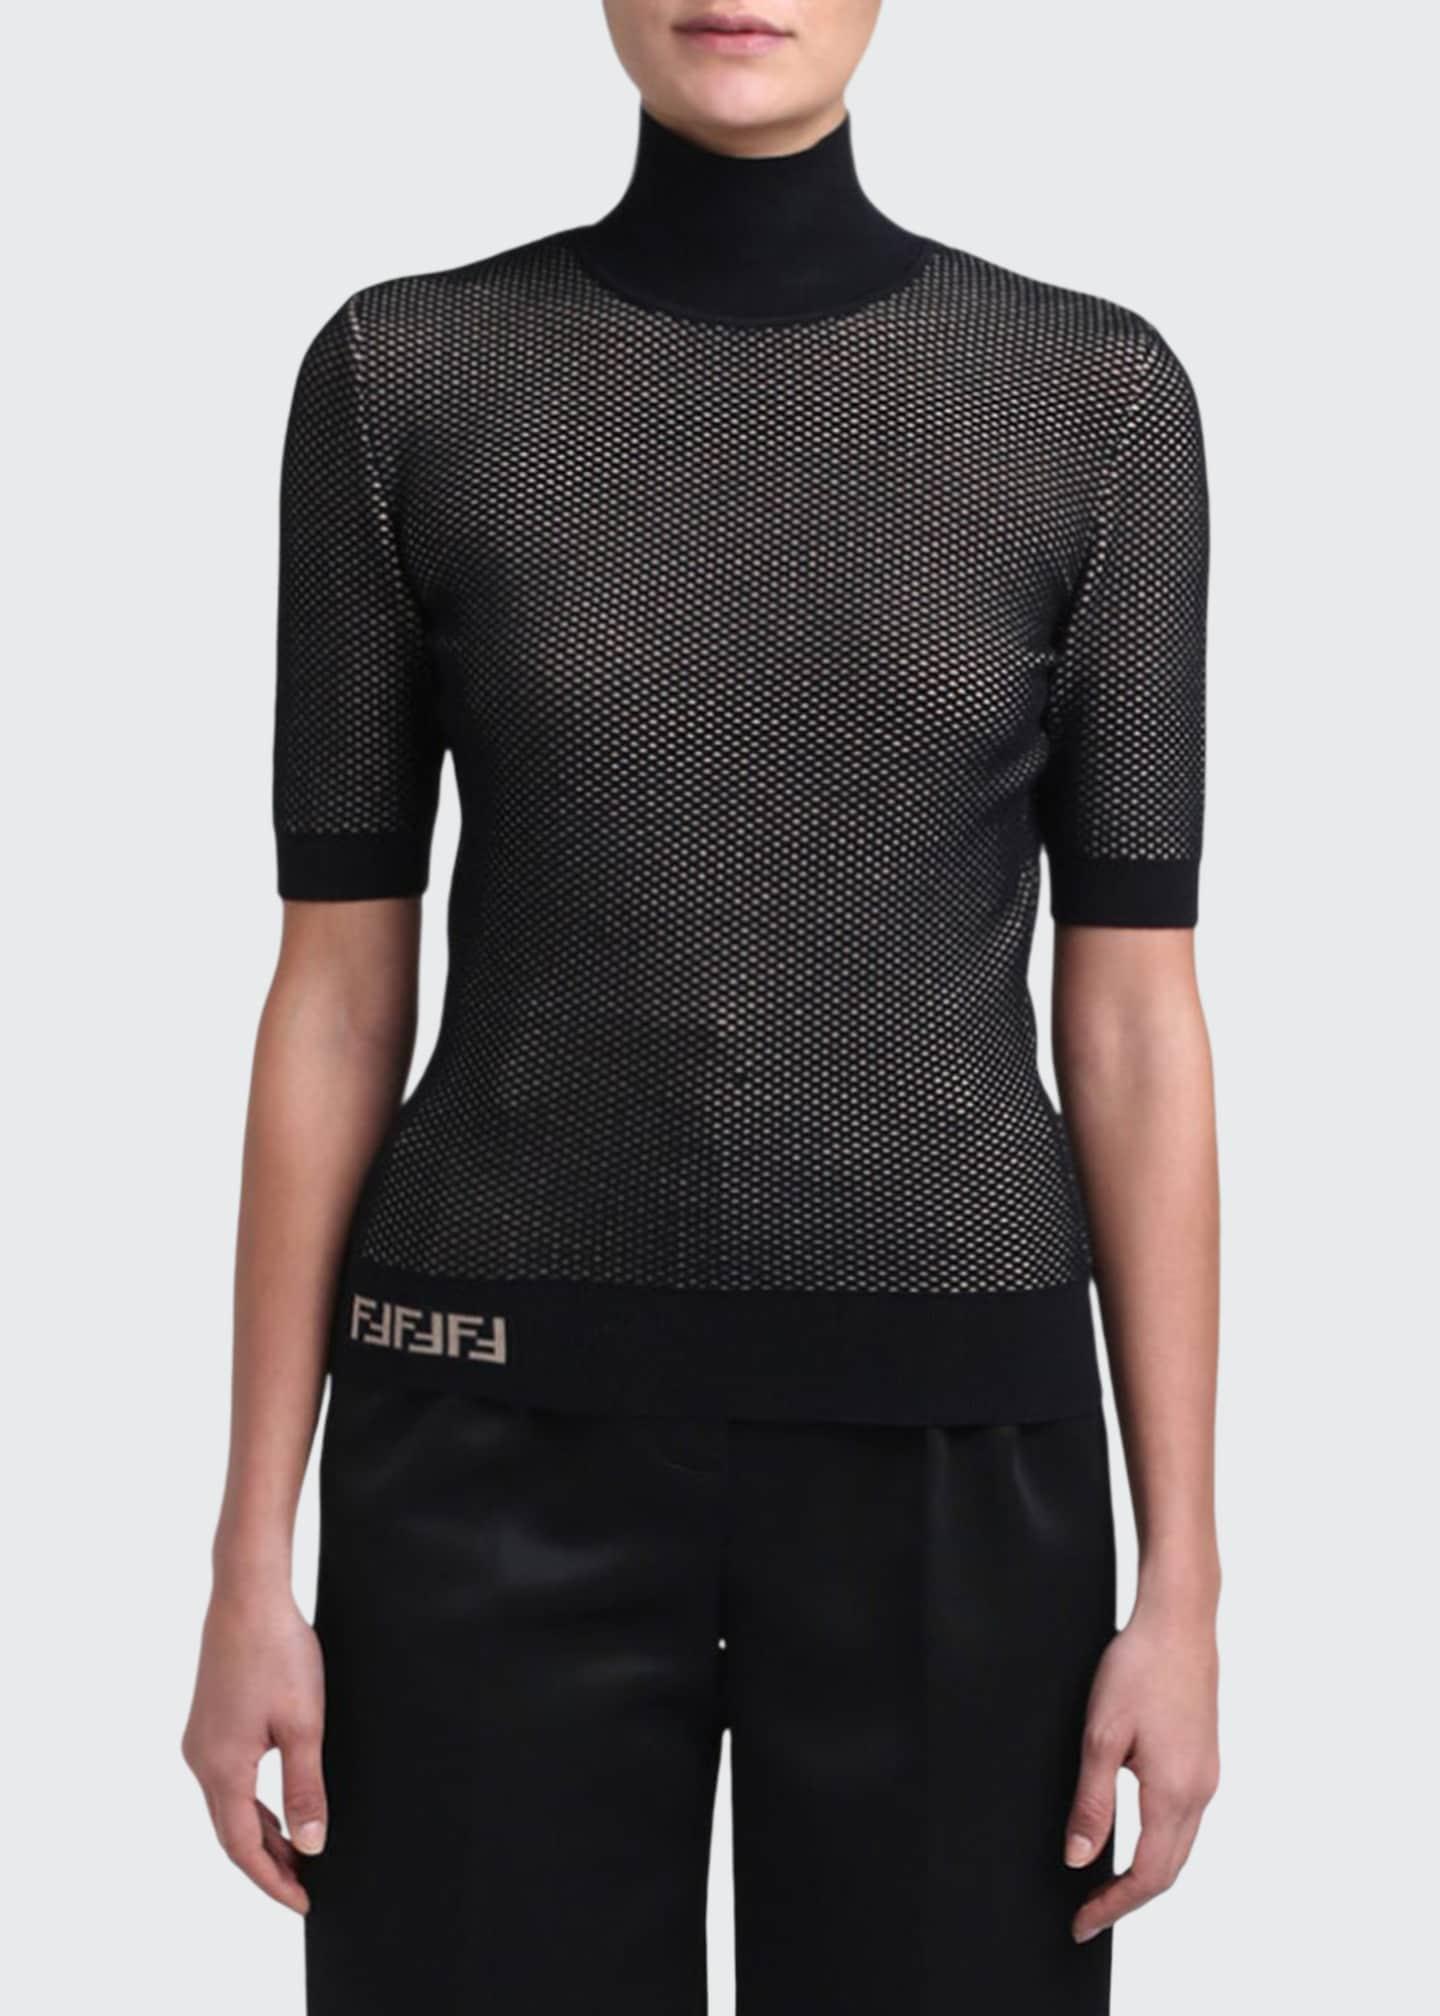 Fendi Mesh Knit Turtleneck Sweater